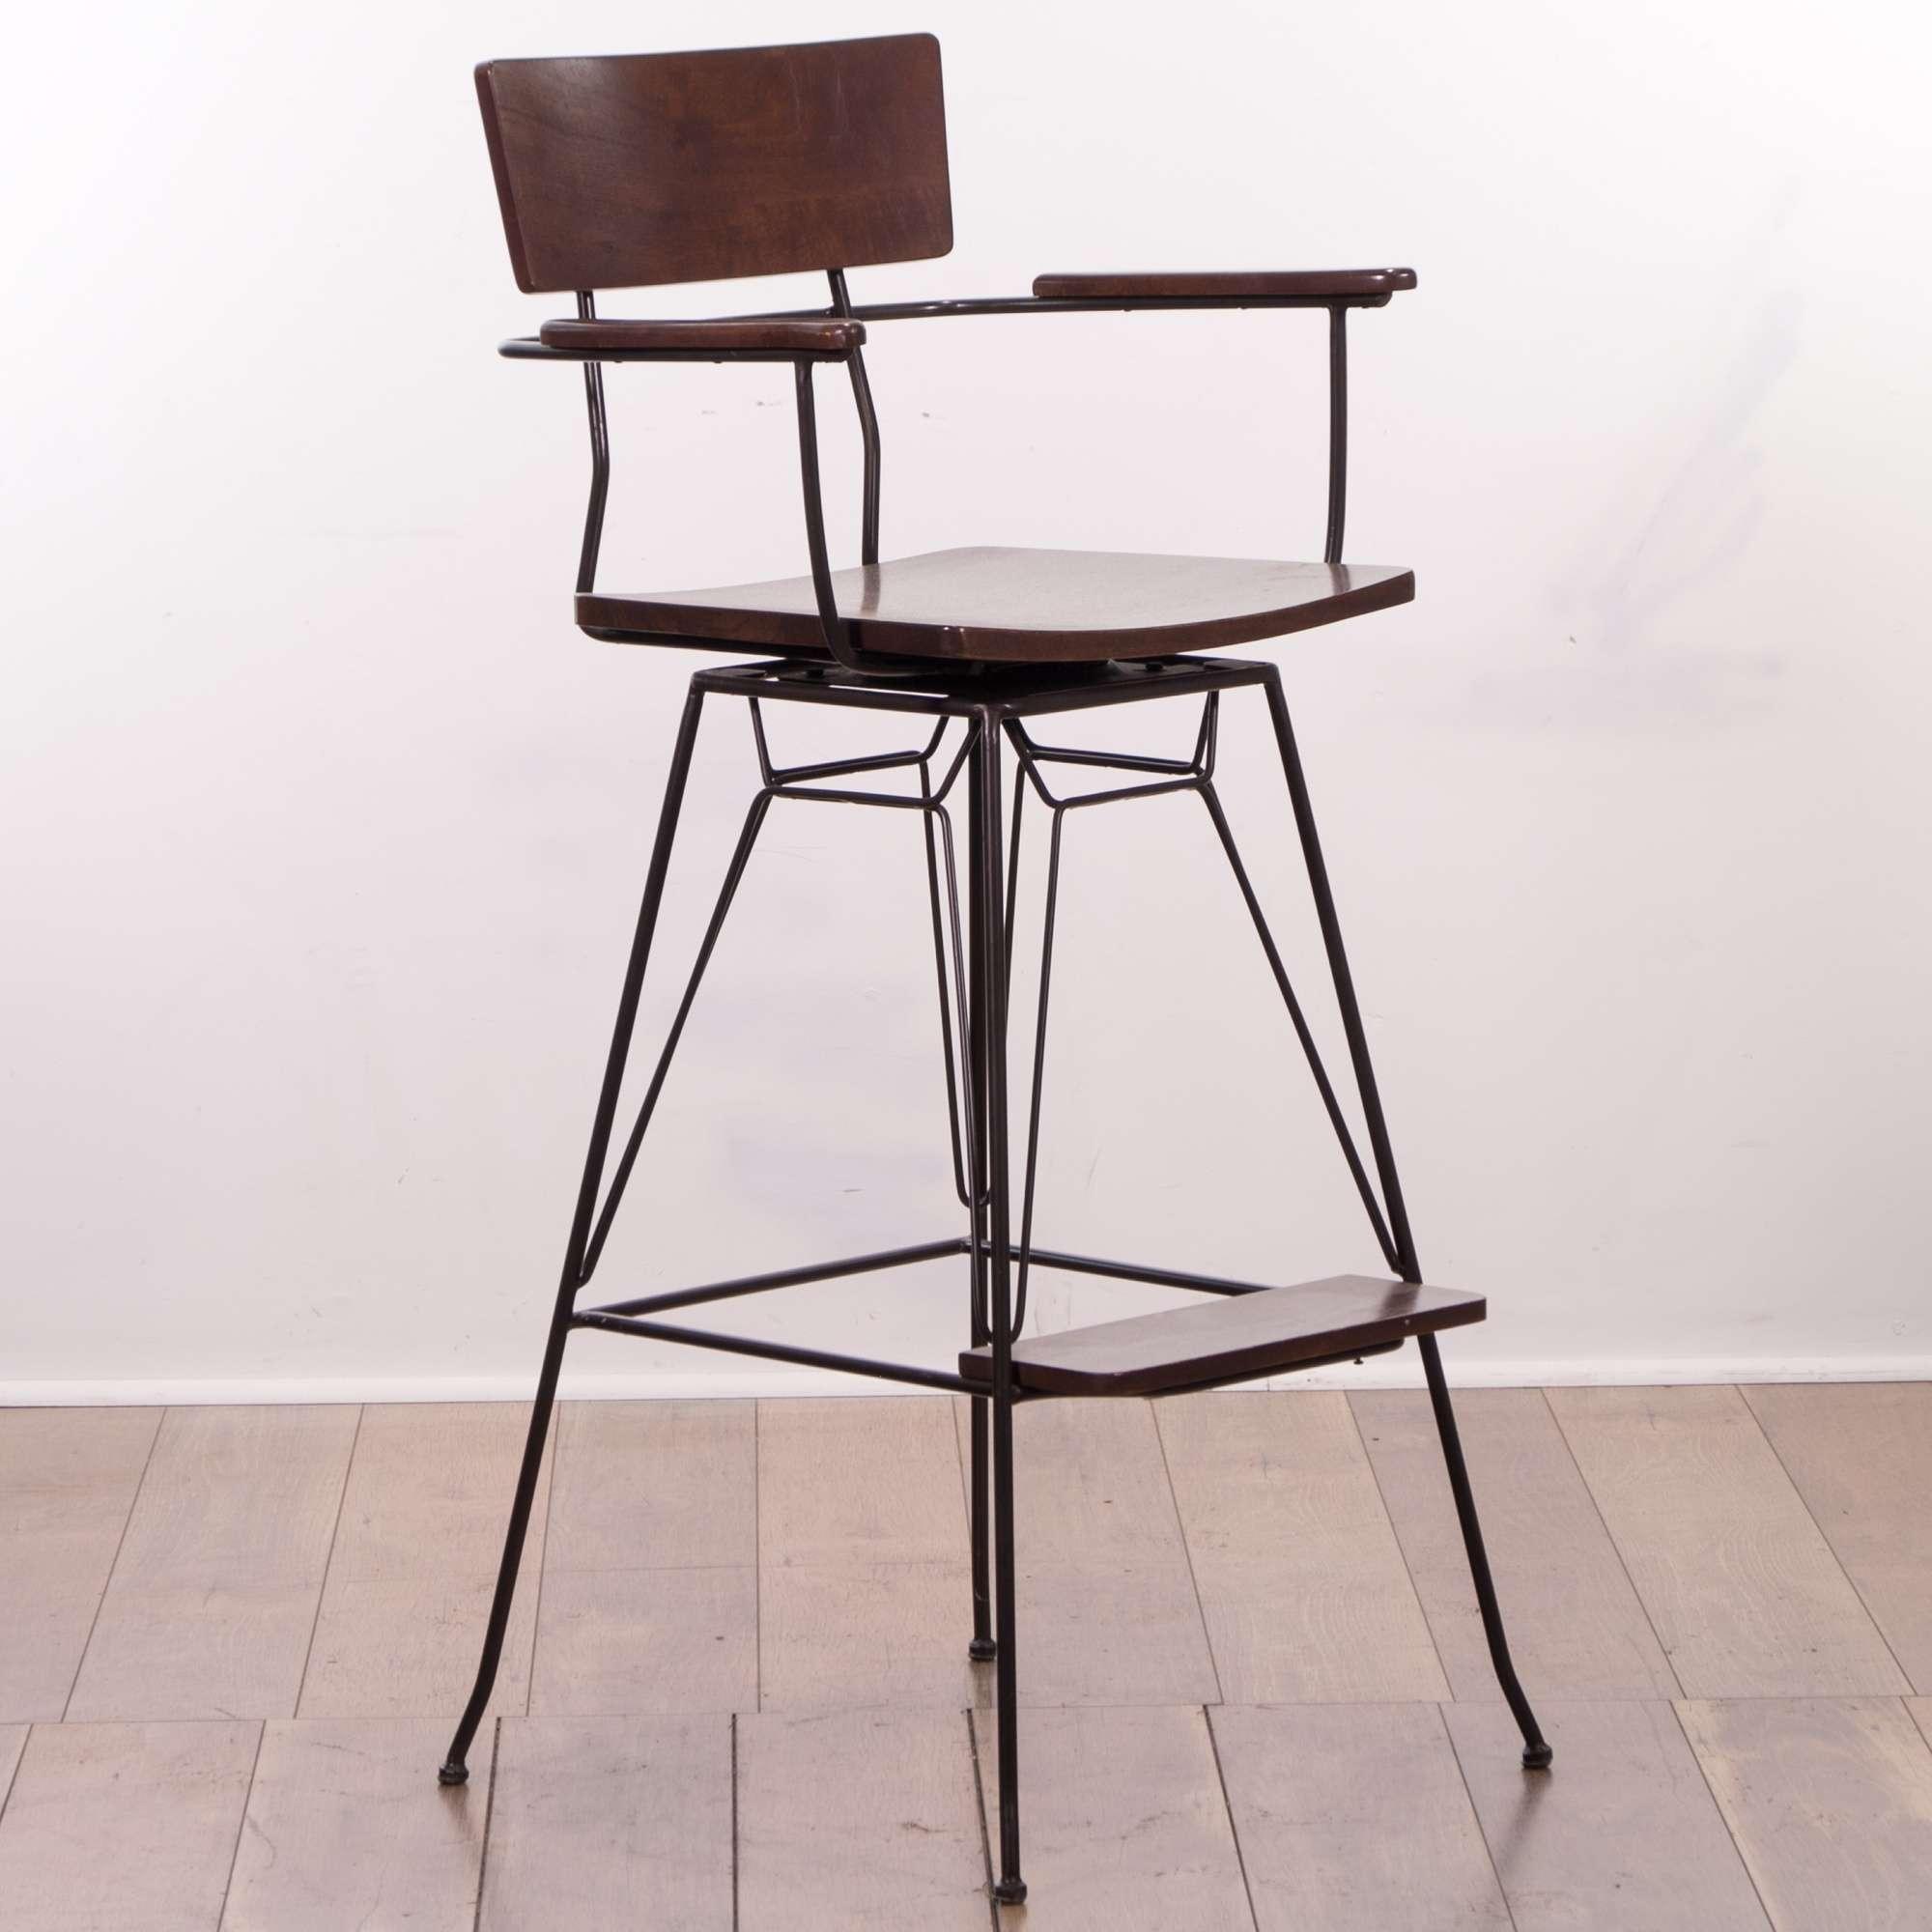 Marvelous 1940S Style Industrial Metal Frame Bar Stool Loveseat Cjindustries Chair Design For Home Cjindustriesco